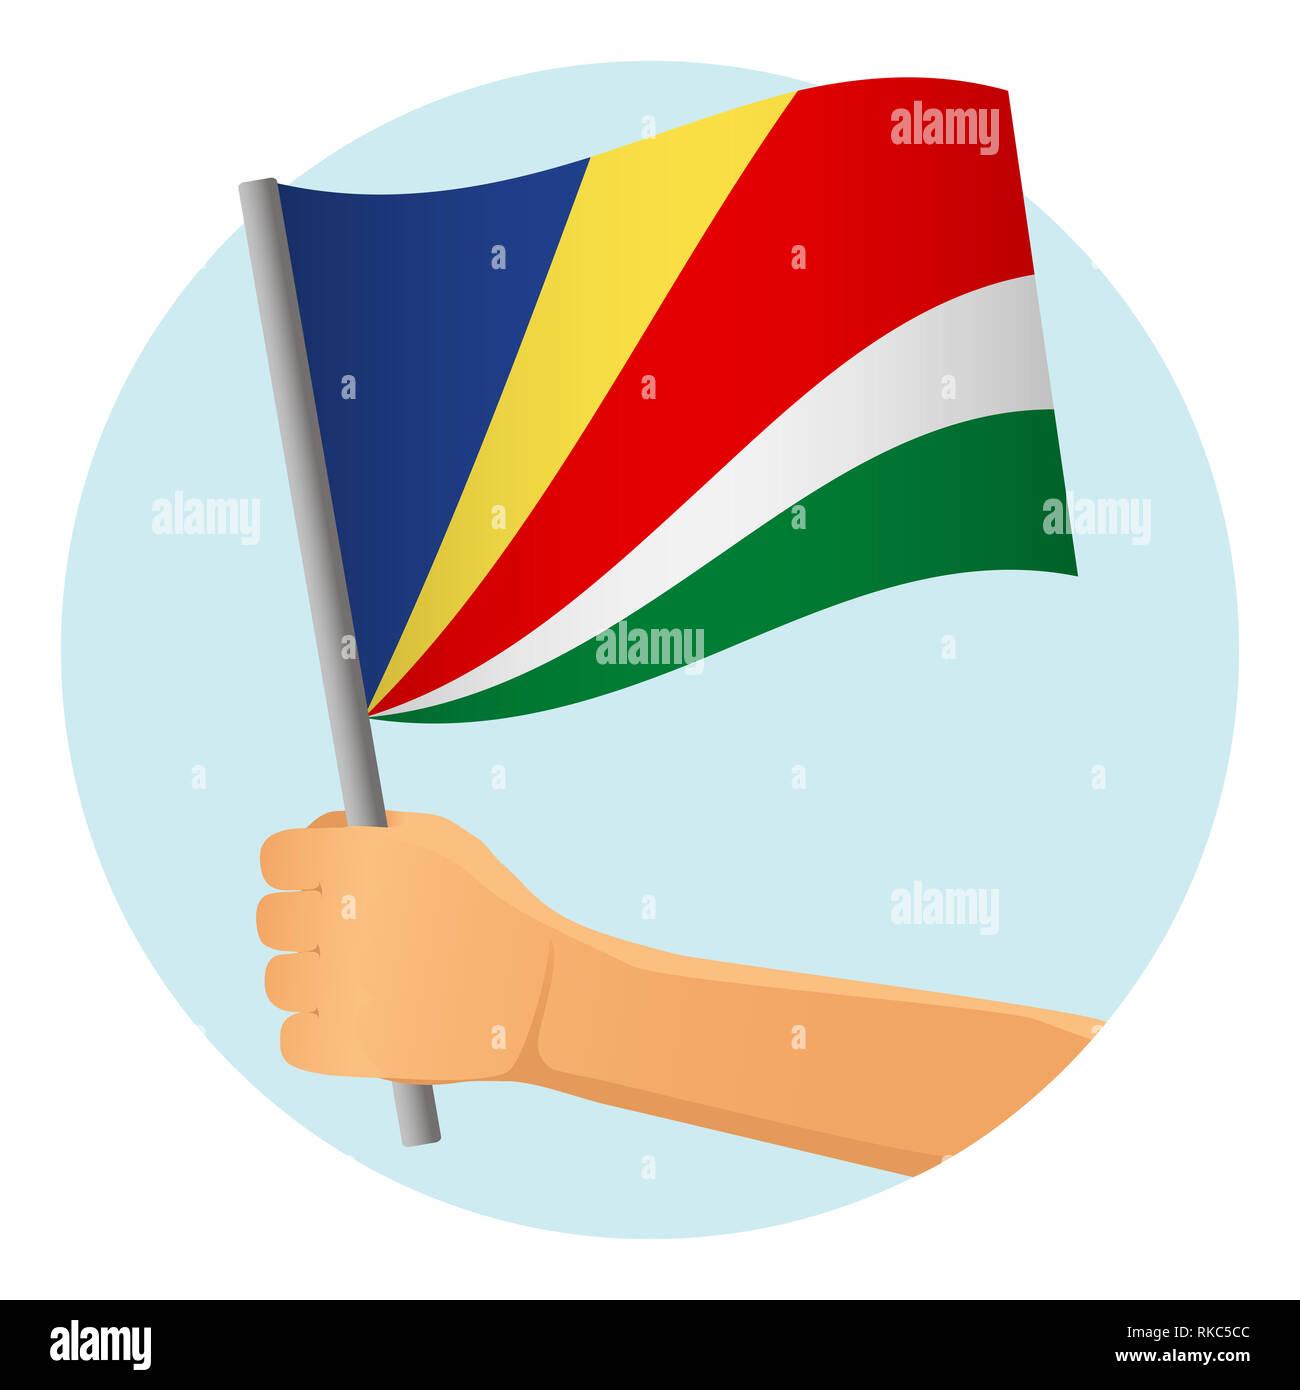 Seychelles flag in hand. Patriotic background. National flag of Seychelles  illustration - Stock Image